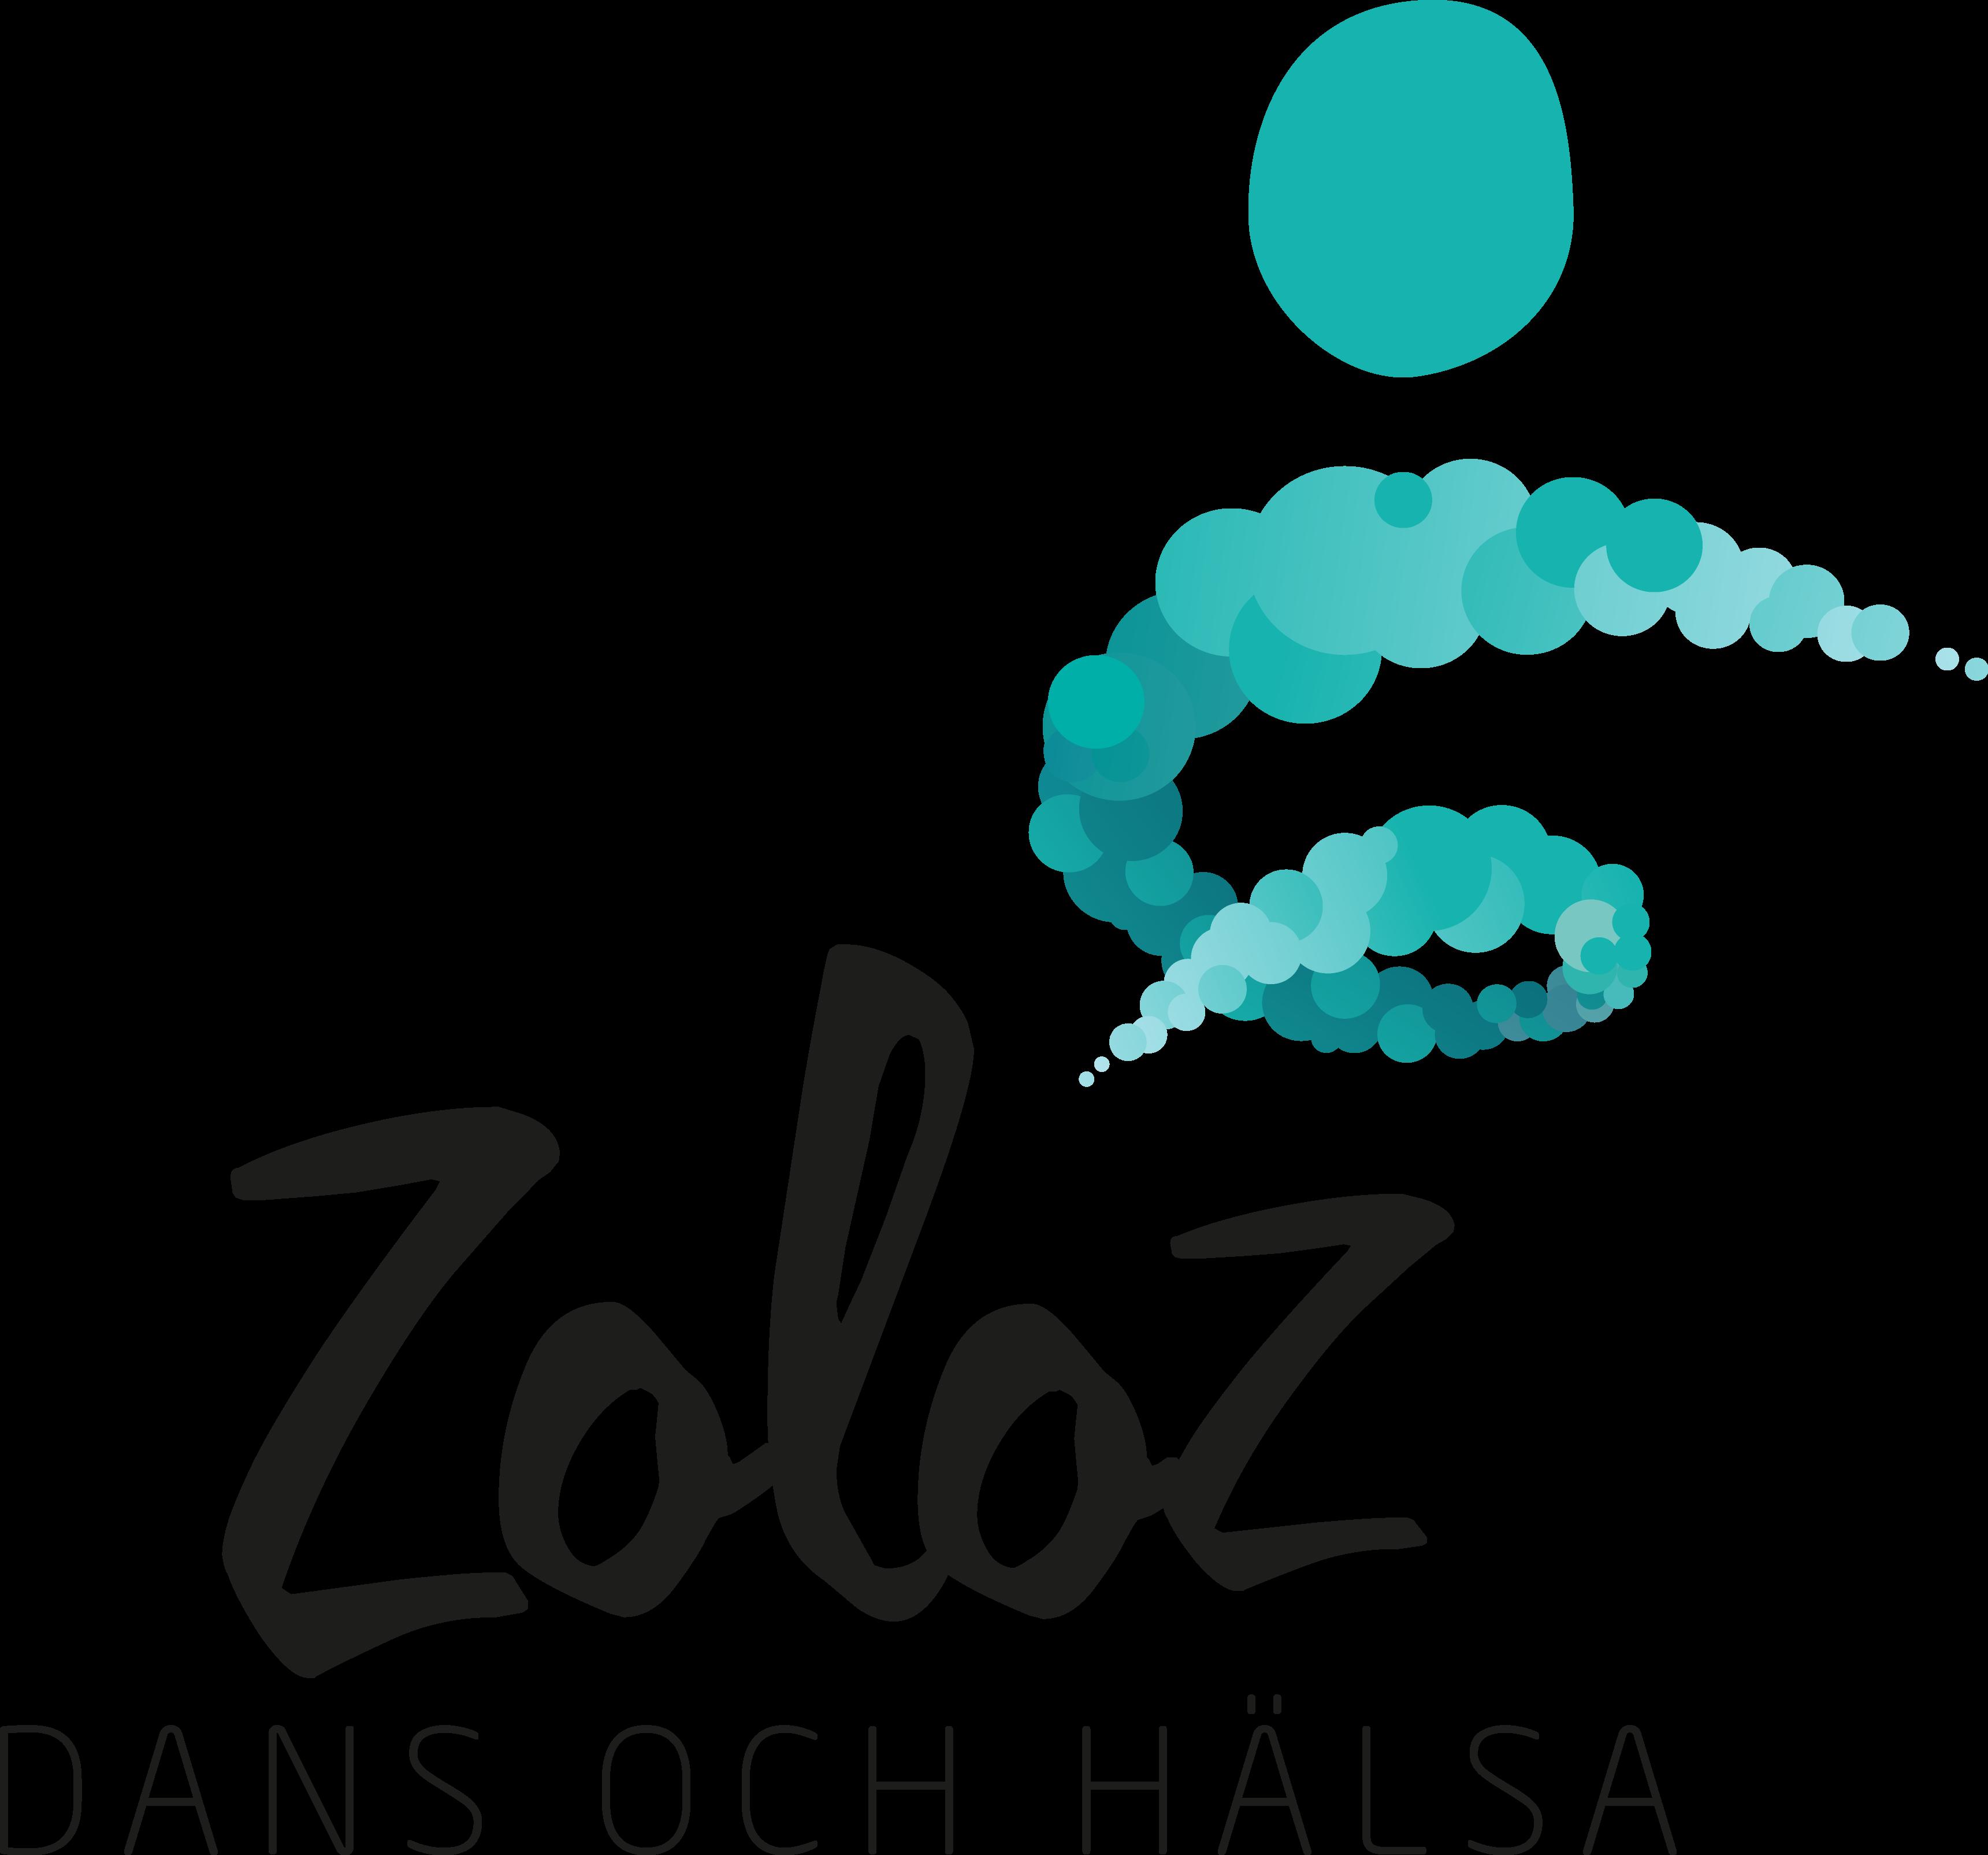 Zoloz – dans och hälsa